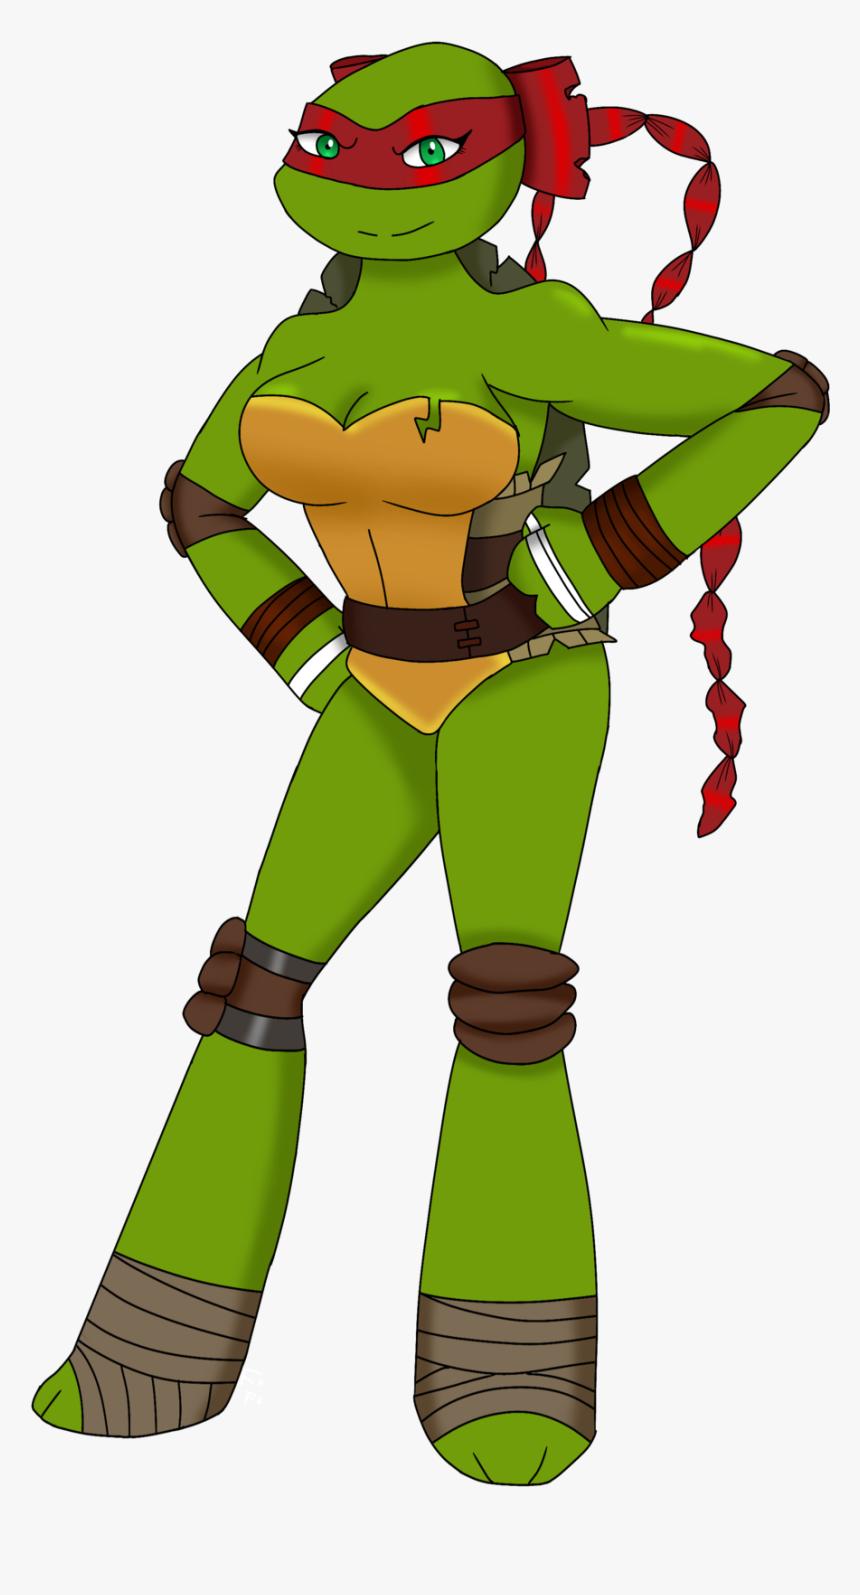 Image Ninja Turtle Raphael Female Hd Png Download Kindpng